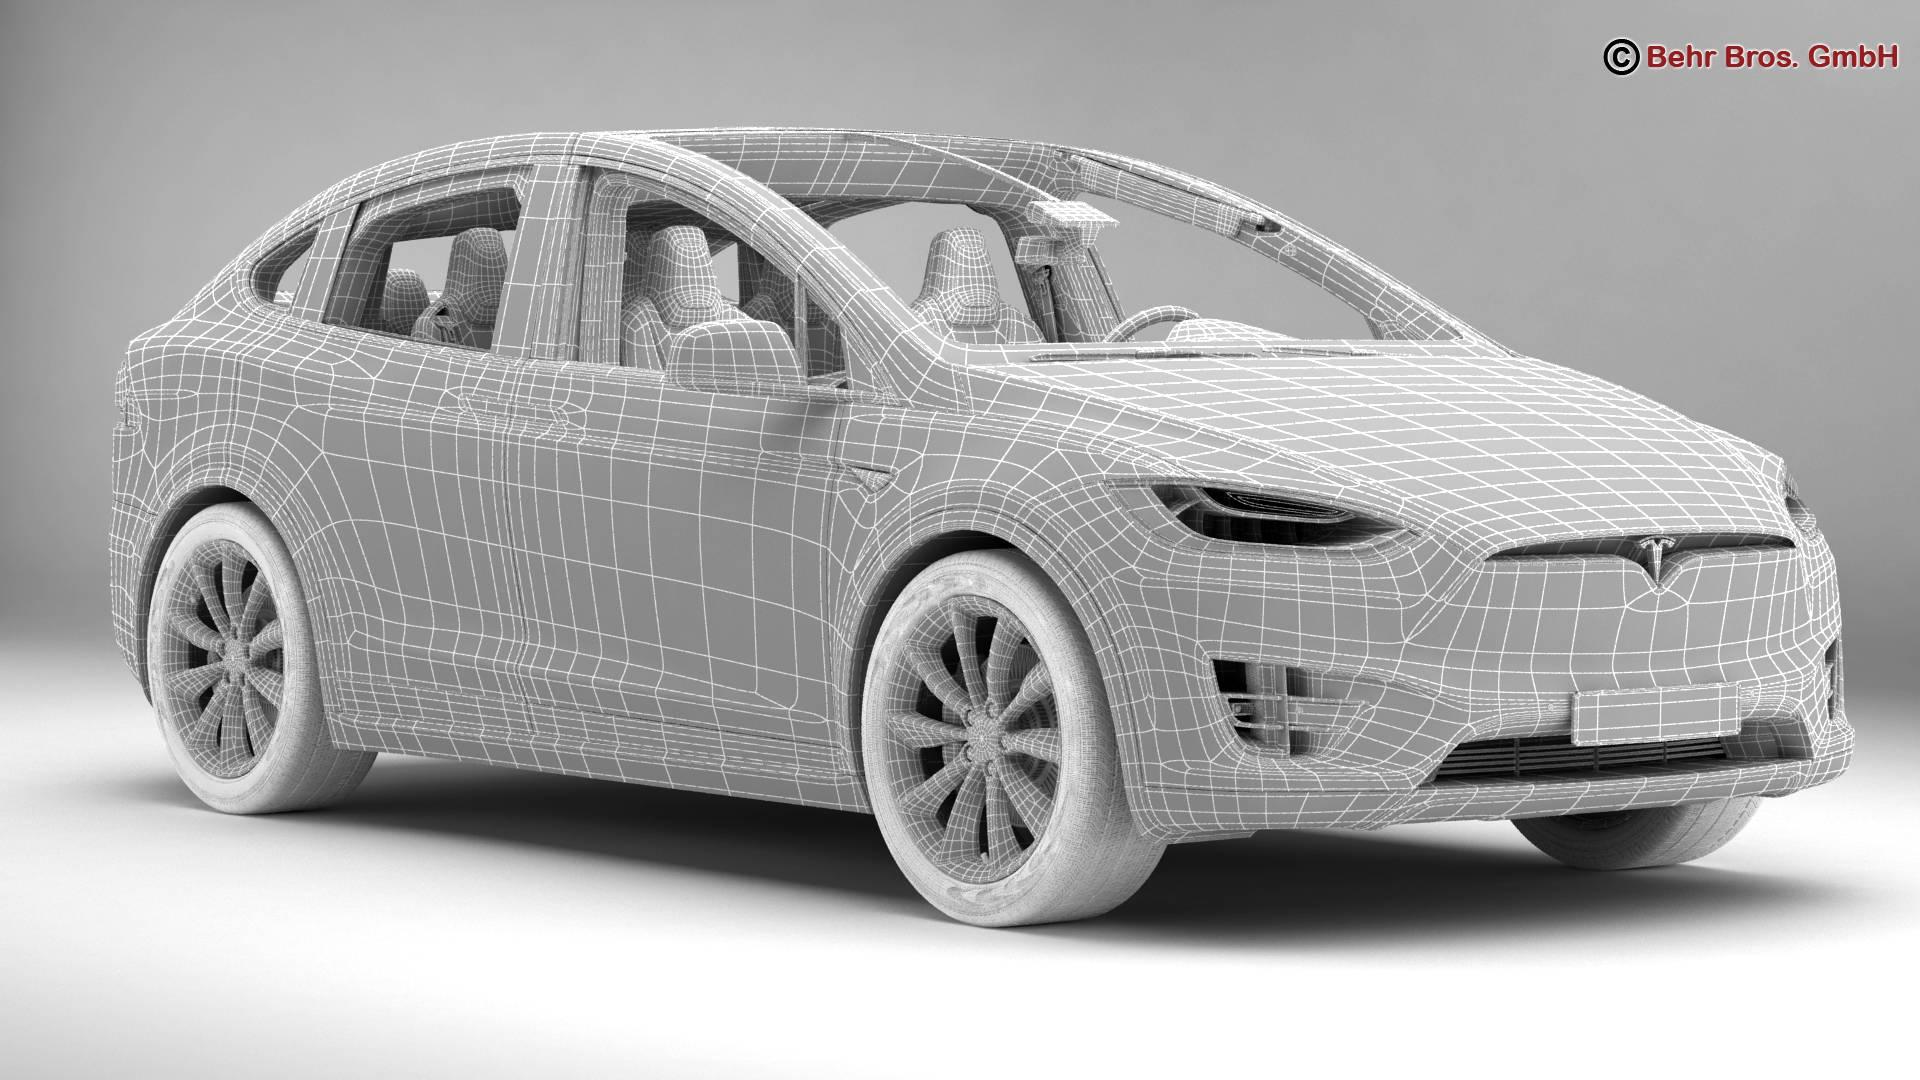 tesla model x 2017 3d model 3ds max fbx c4d lwo ma mb obj 221847